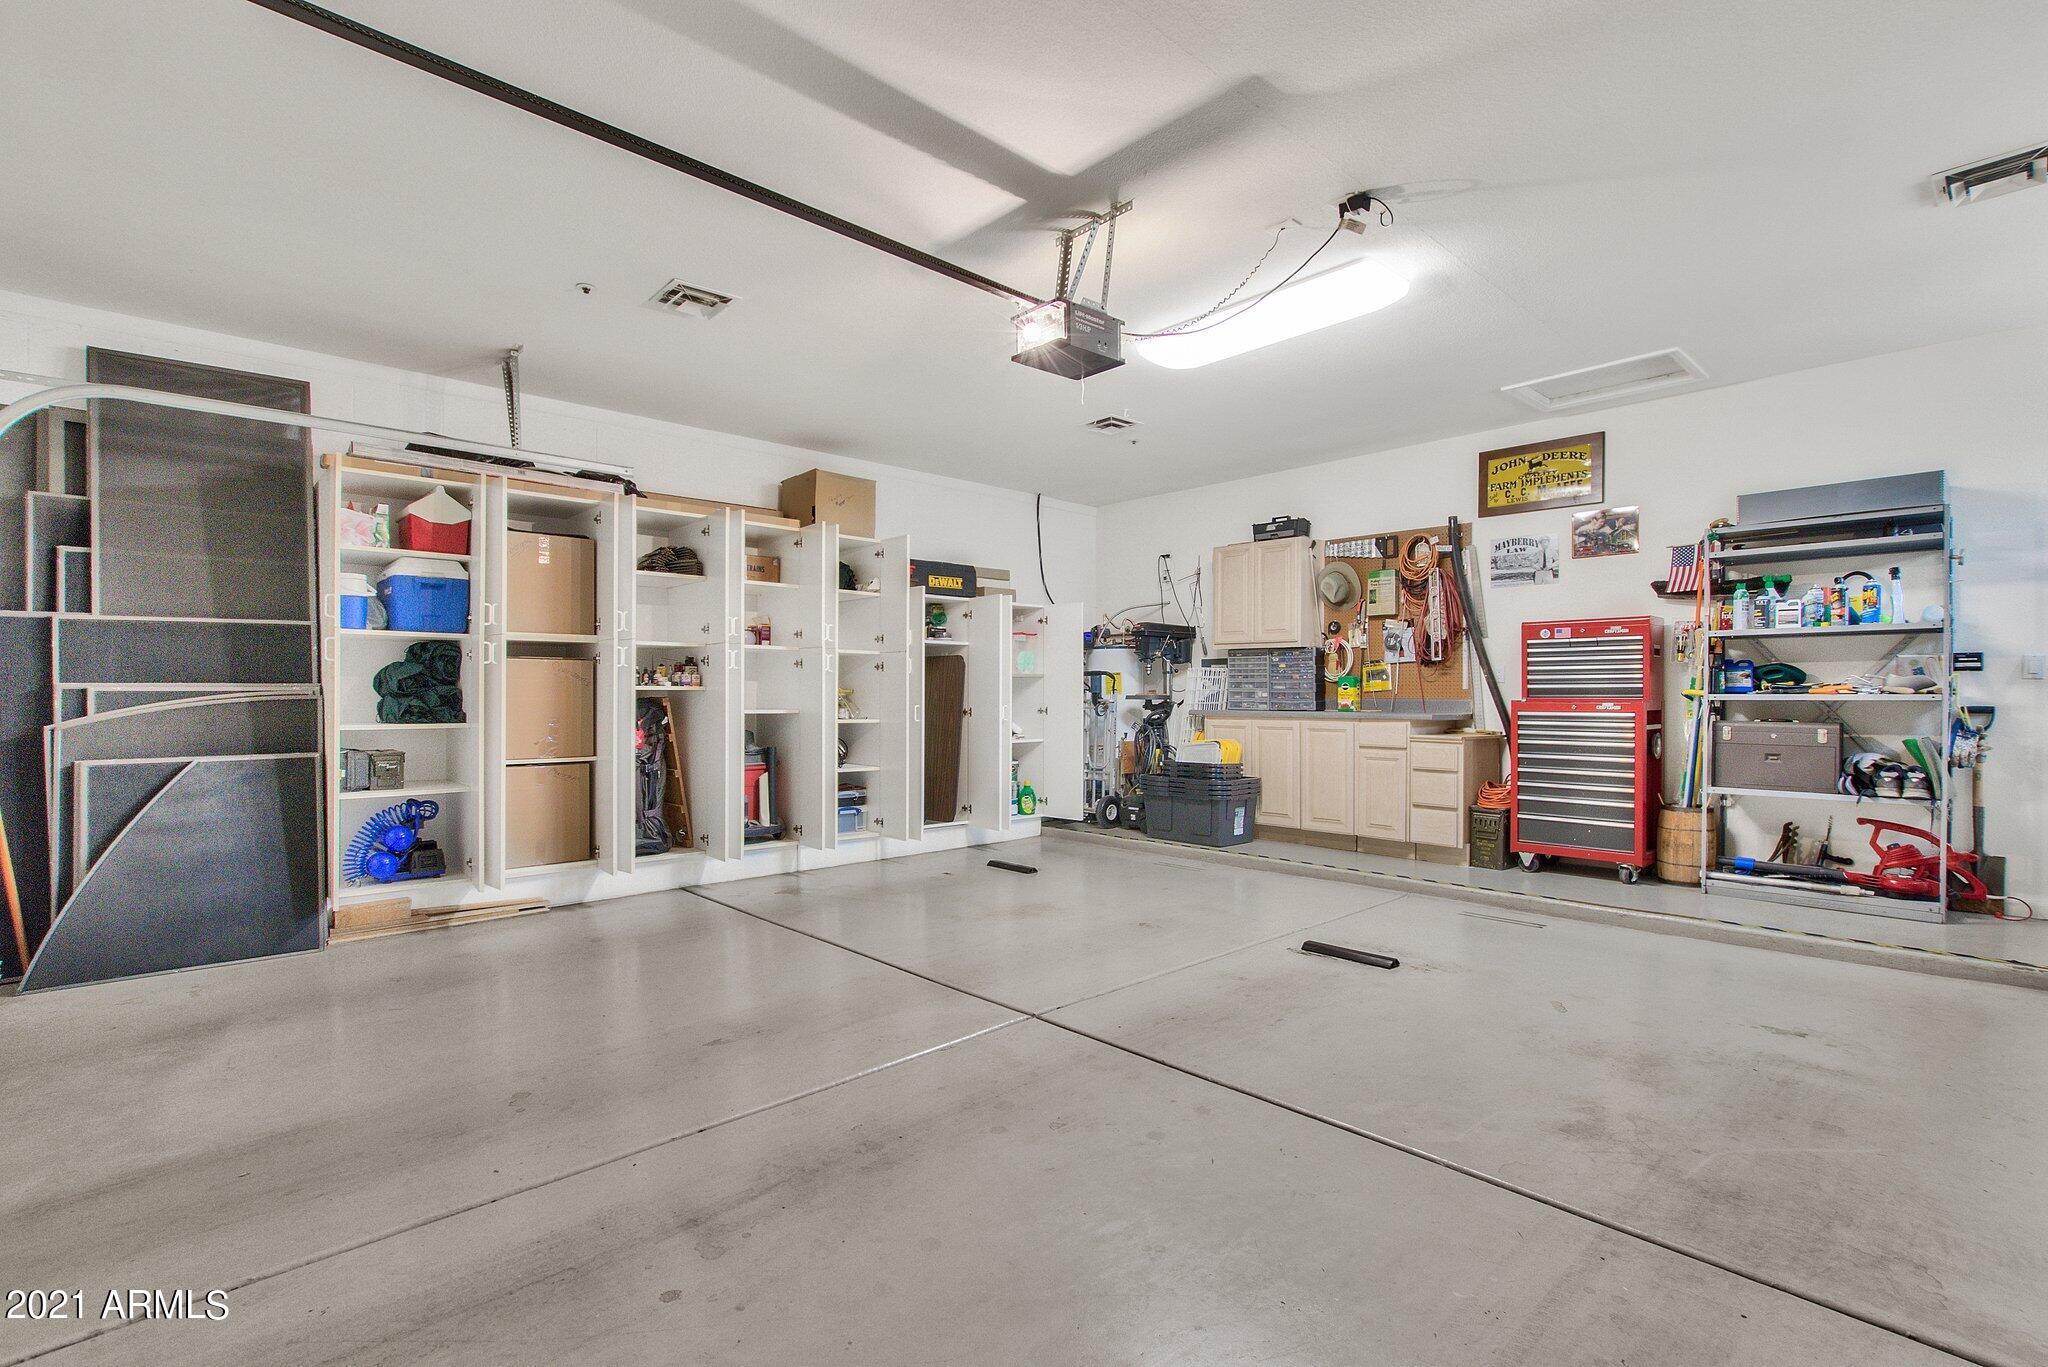 MLS 6289474 7705 E DOUBLETREE RANCH Road Unit 34, Scottsdale, AZ 85258 Scottsdale AZ Gainey Ranch